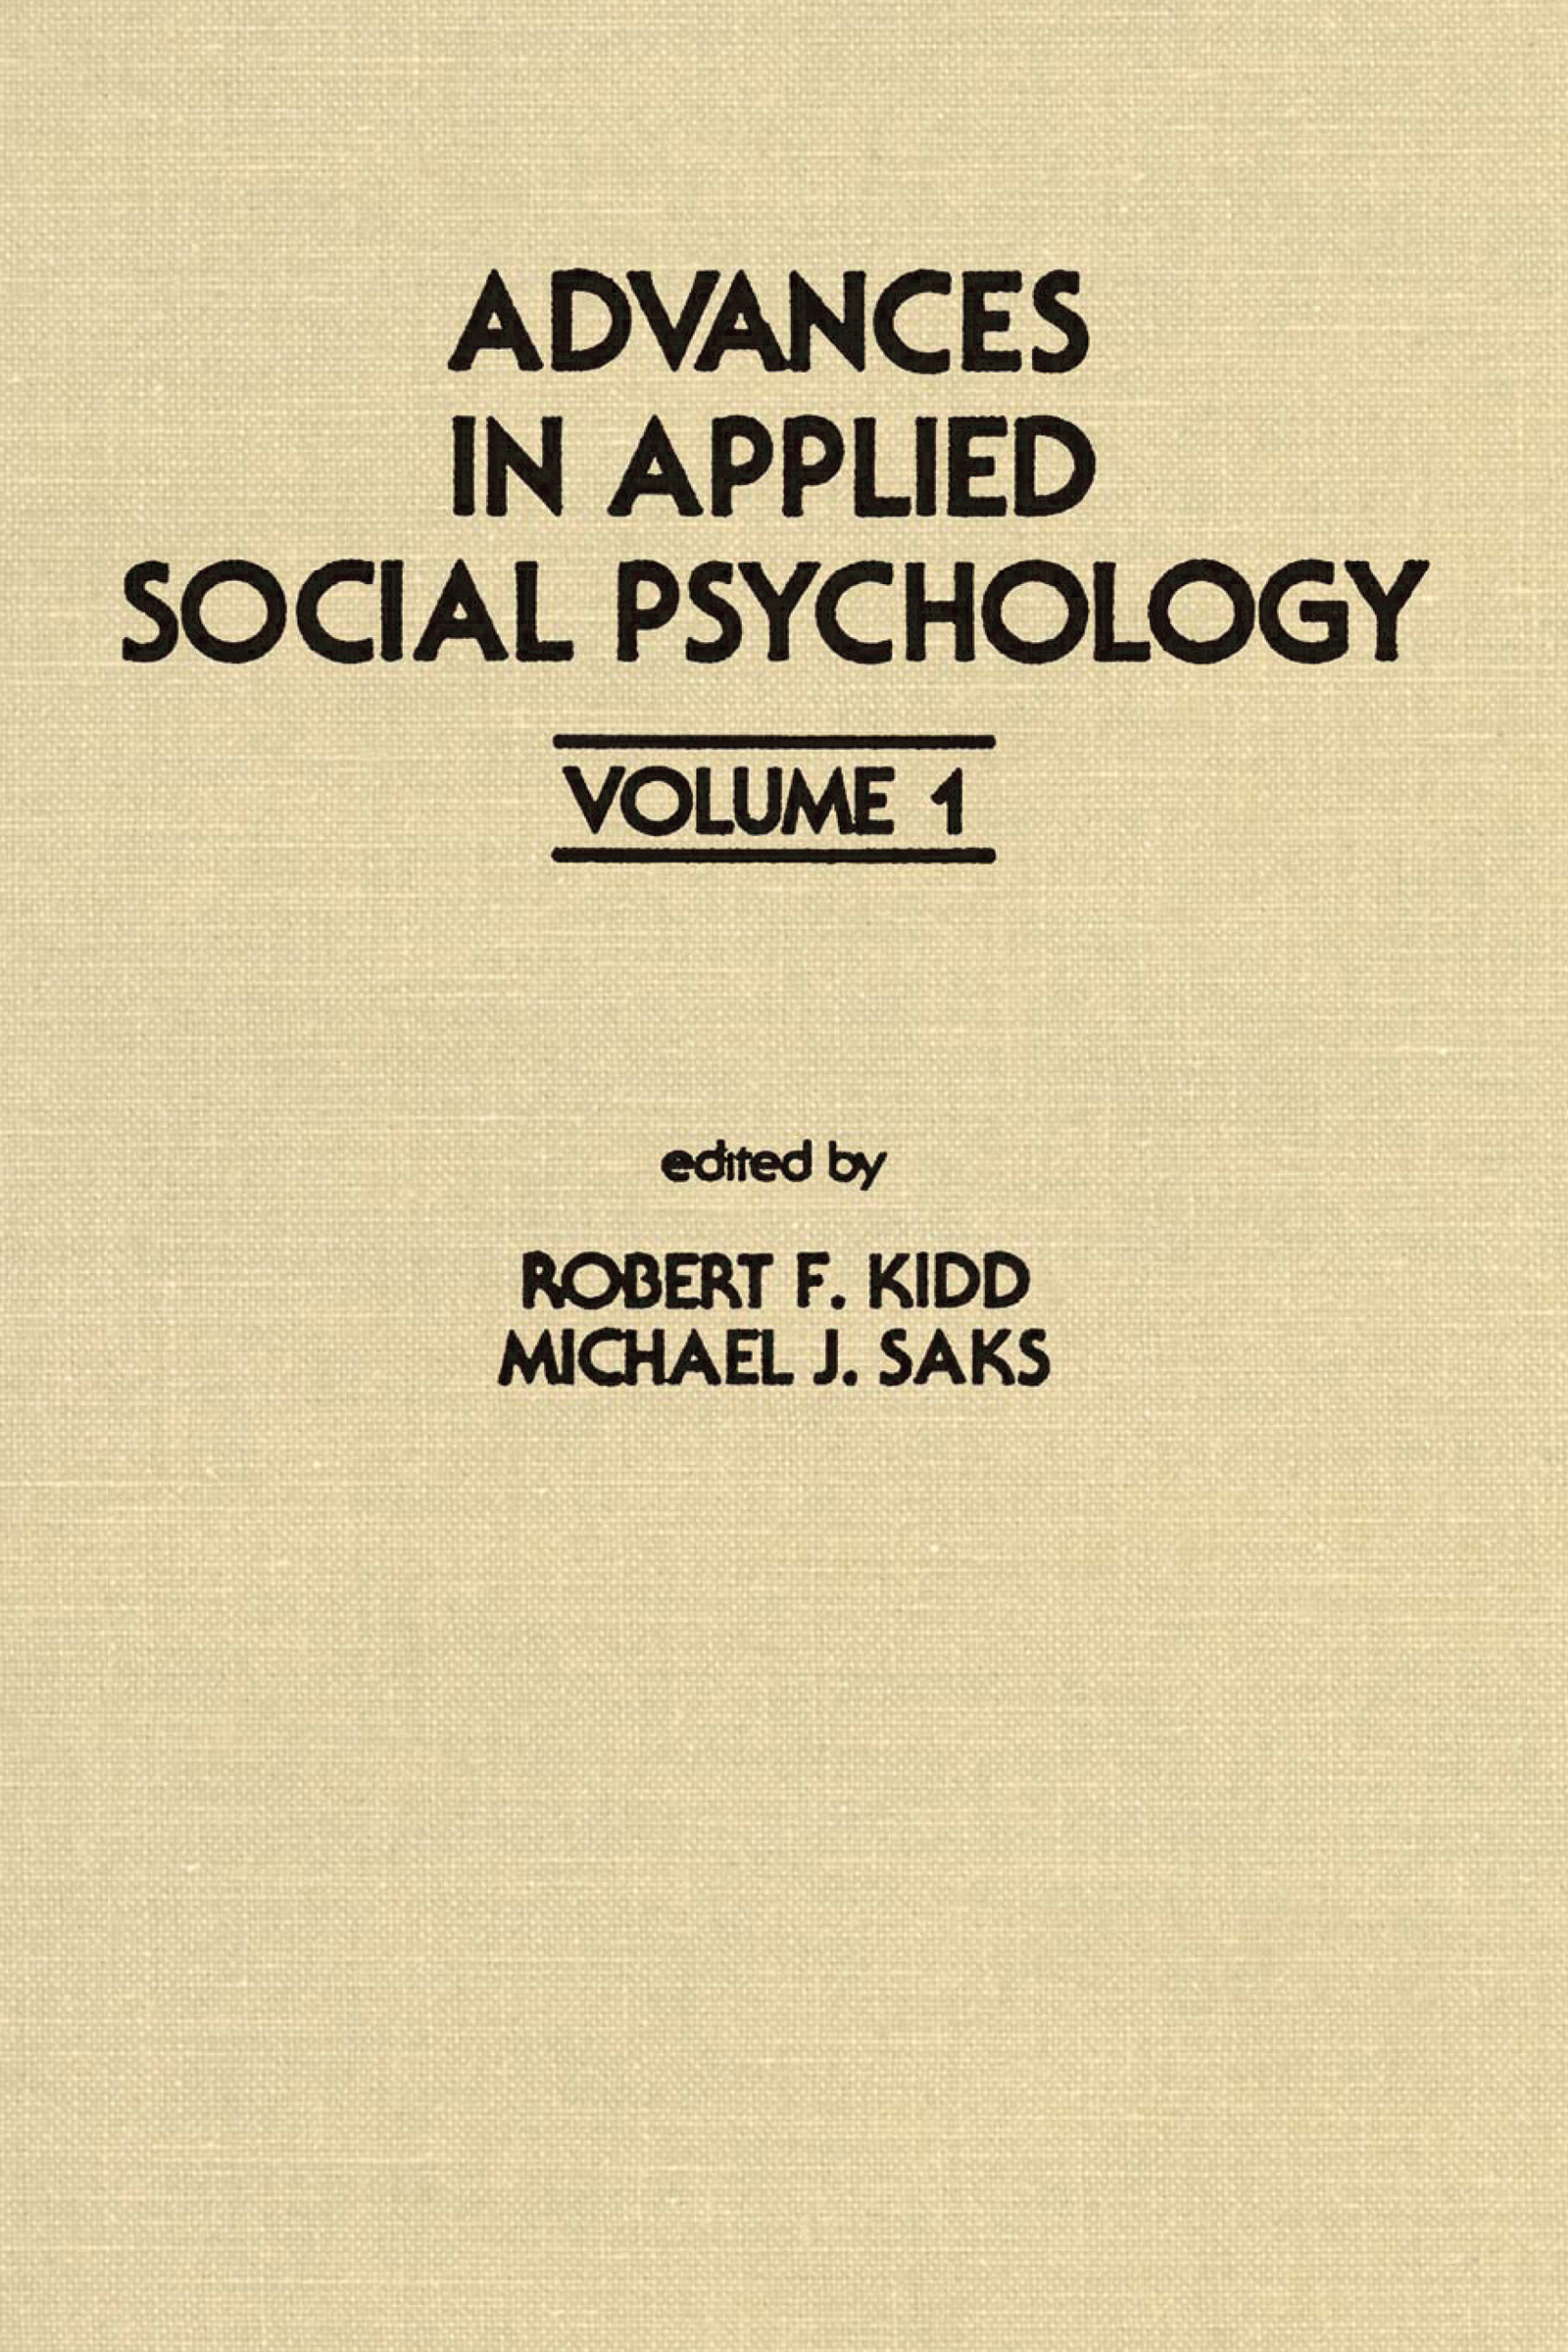 Advances in Applied Social Psychology